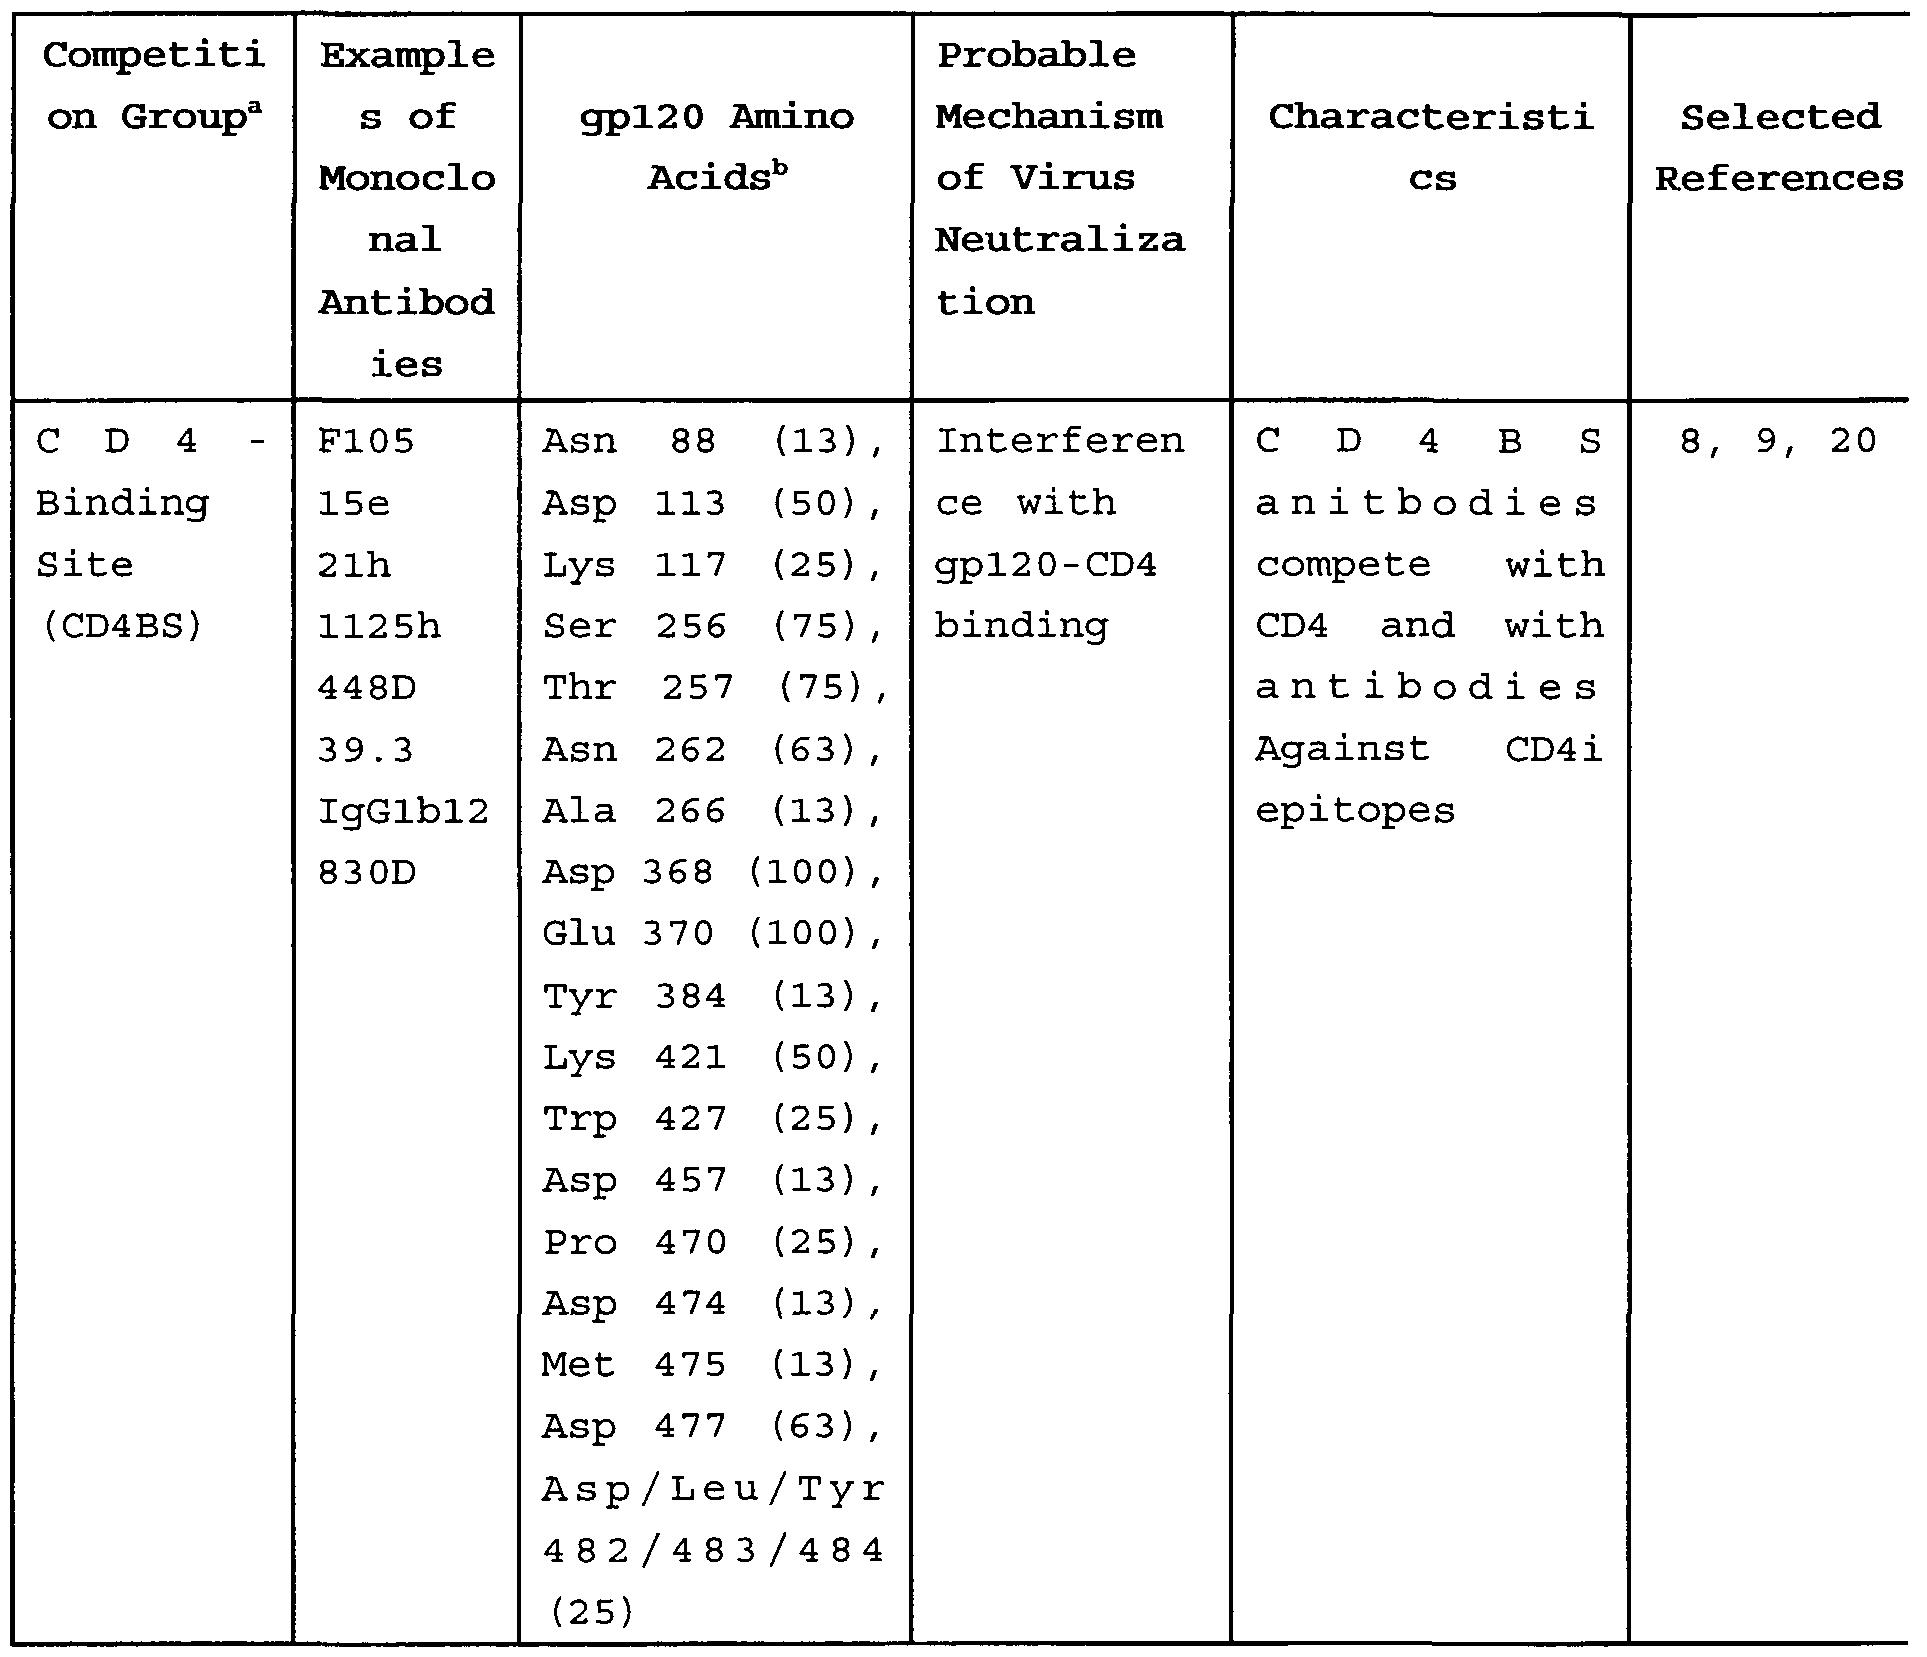 GroГџe Hahn-Compulationen